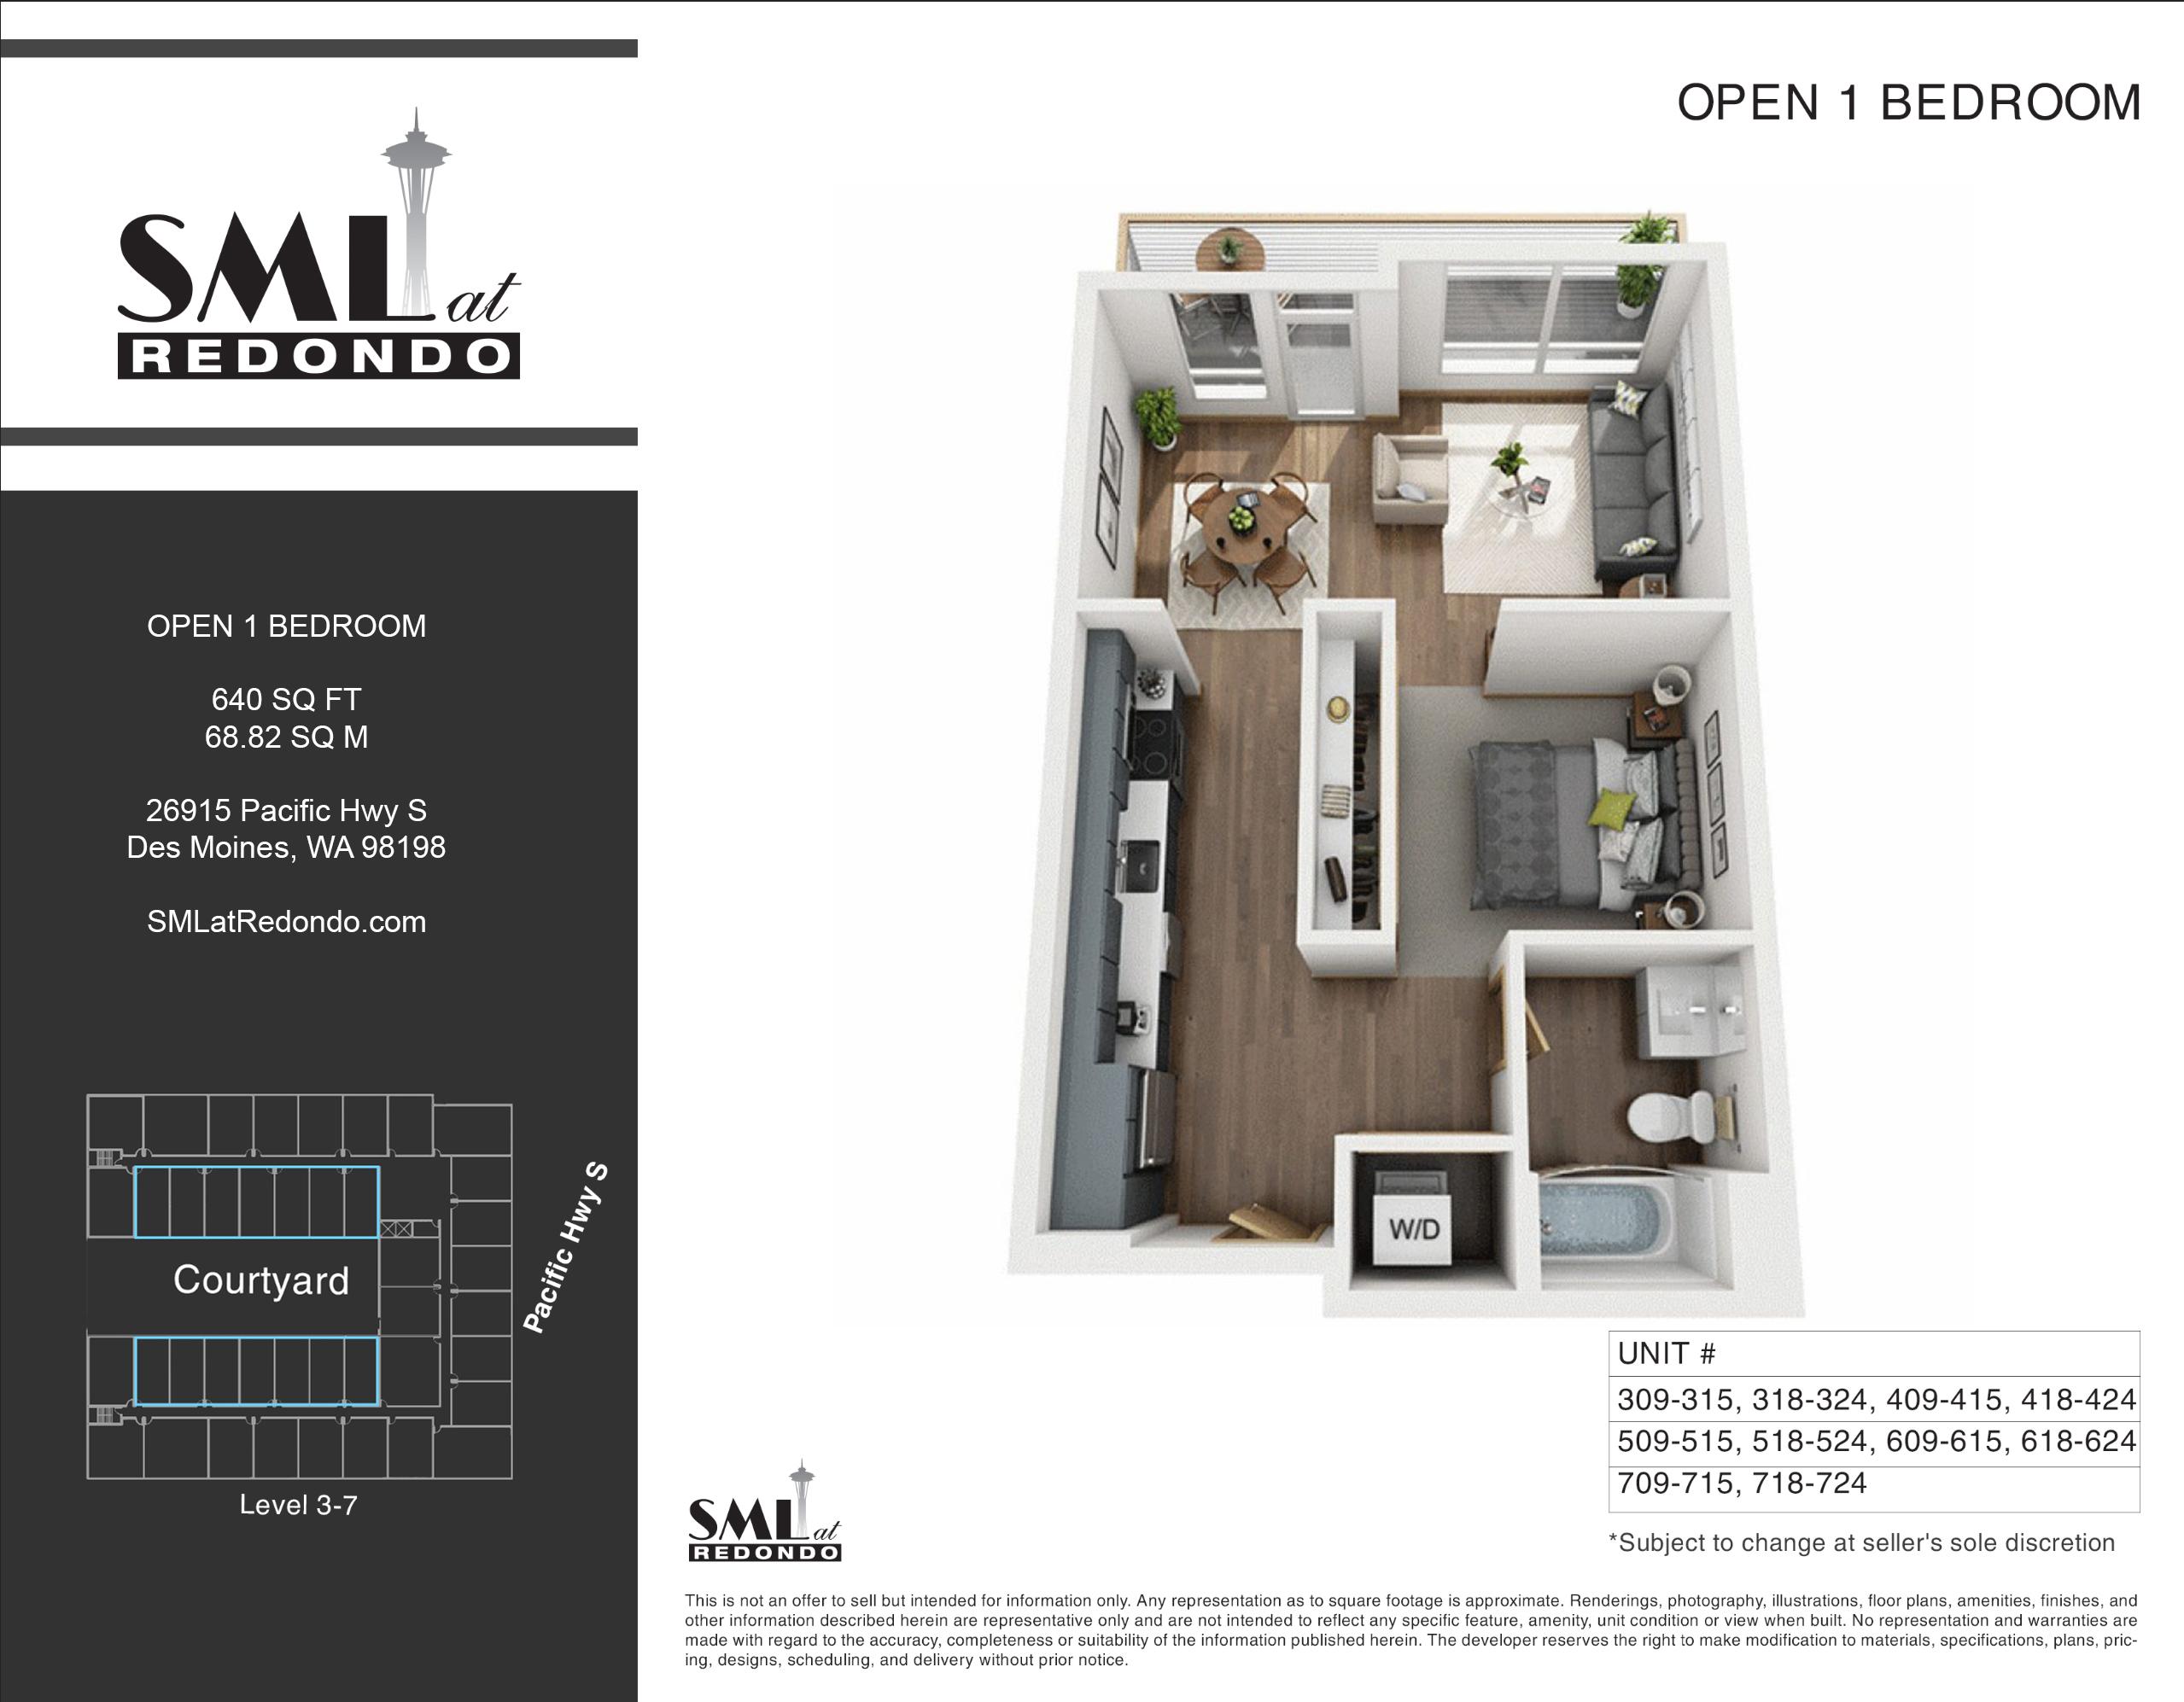 SML Redondo Open 1 Bedroom